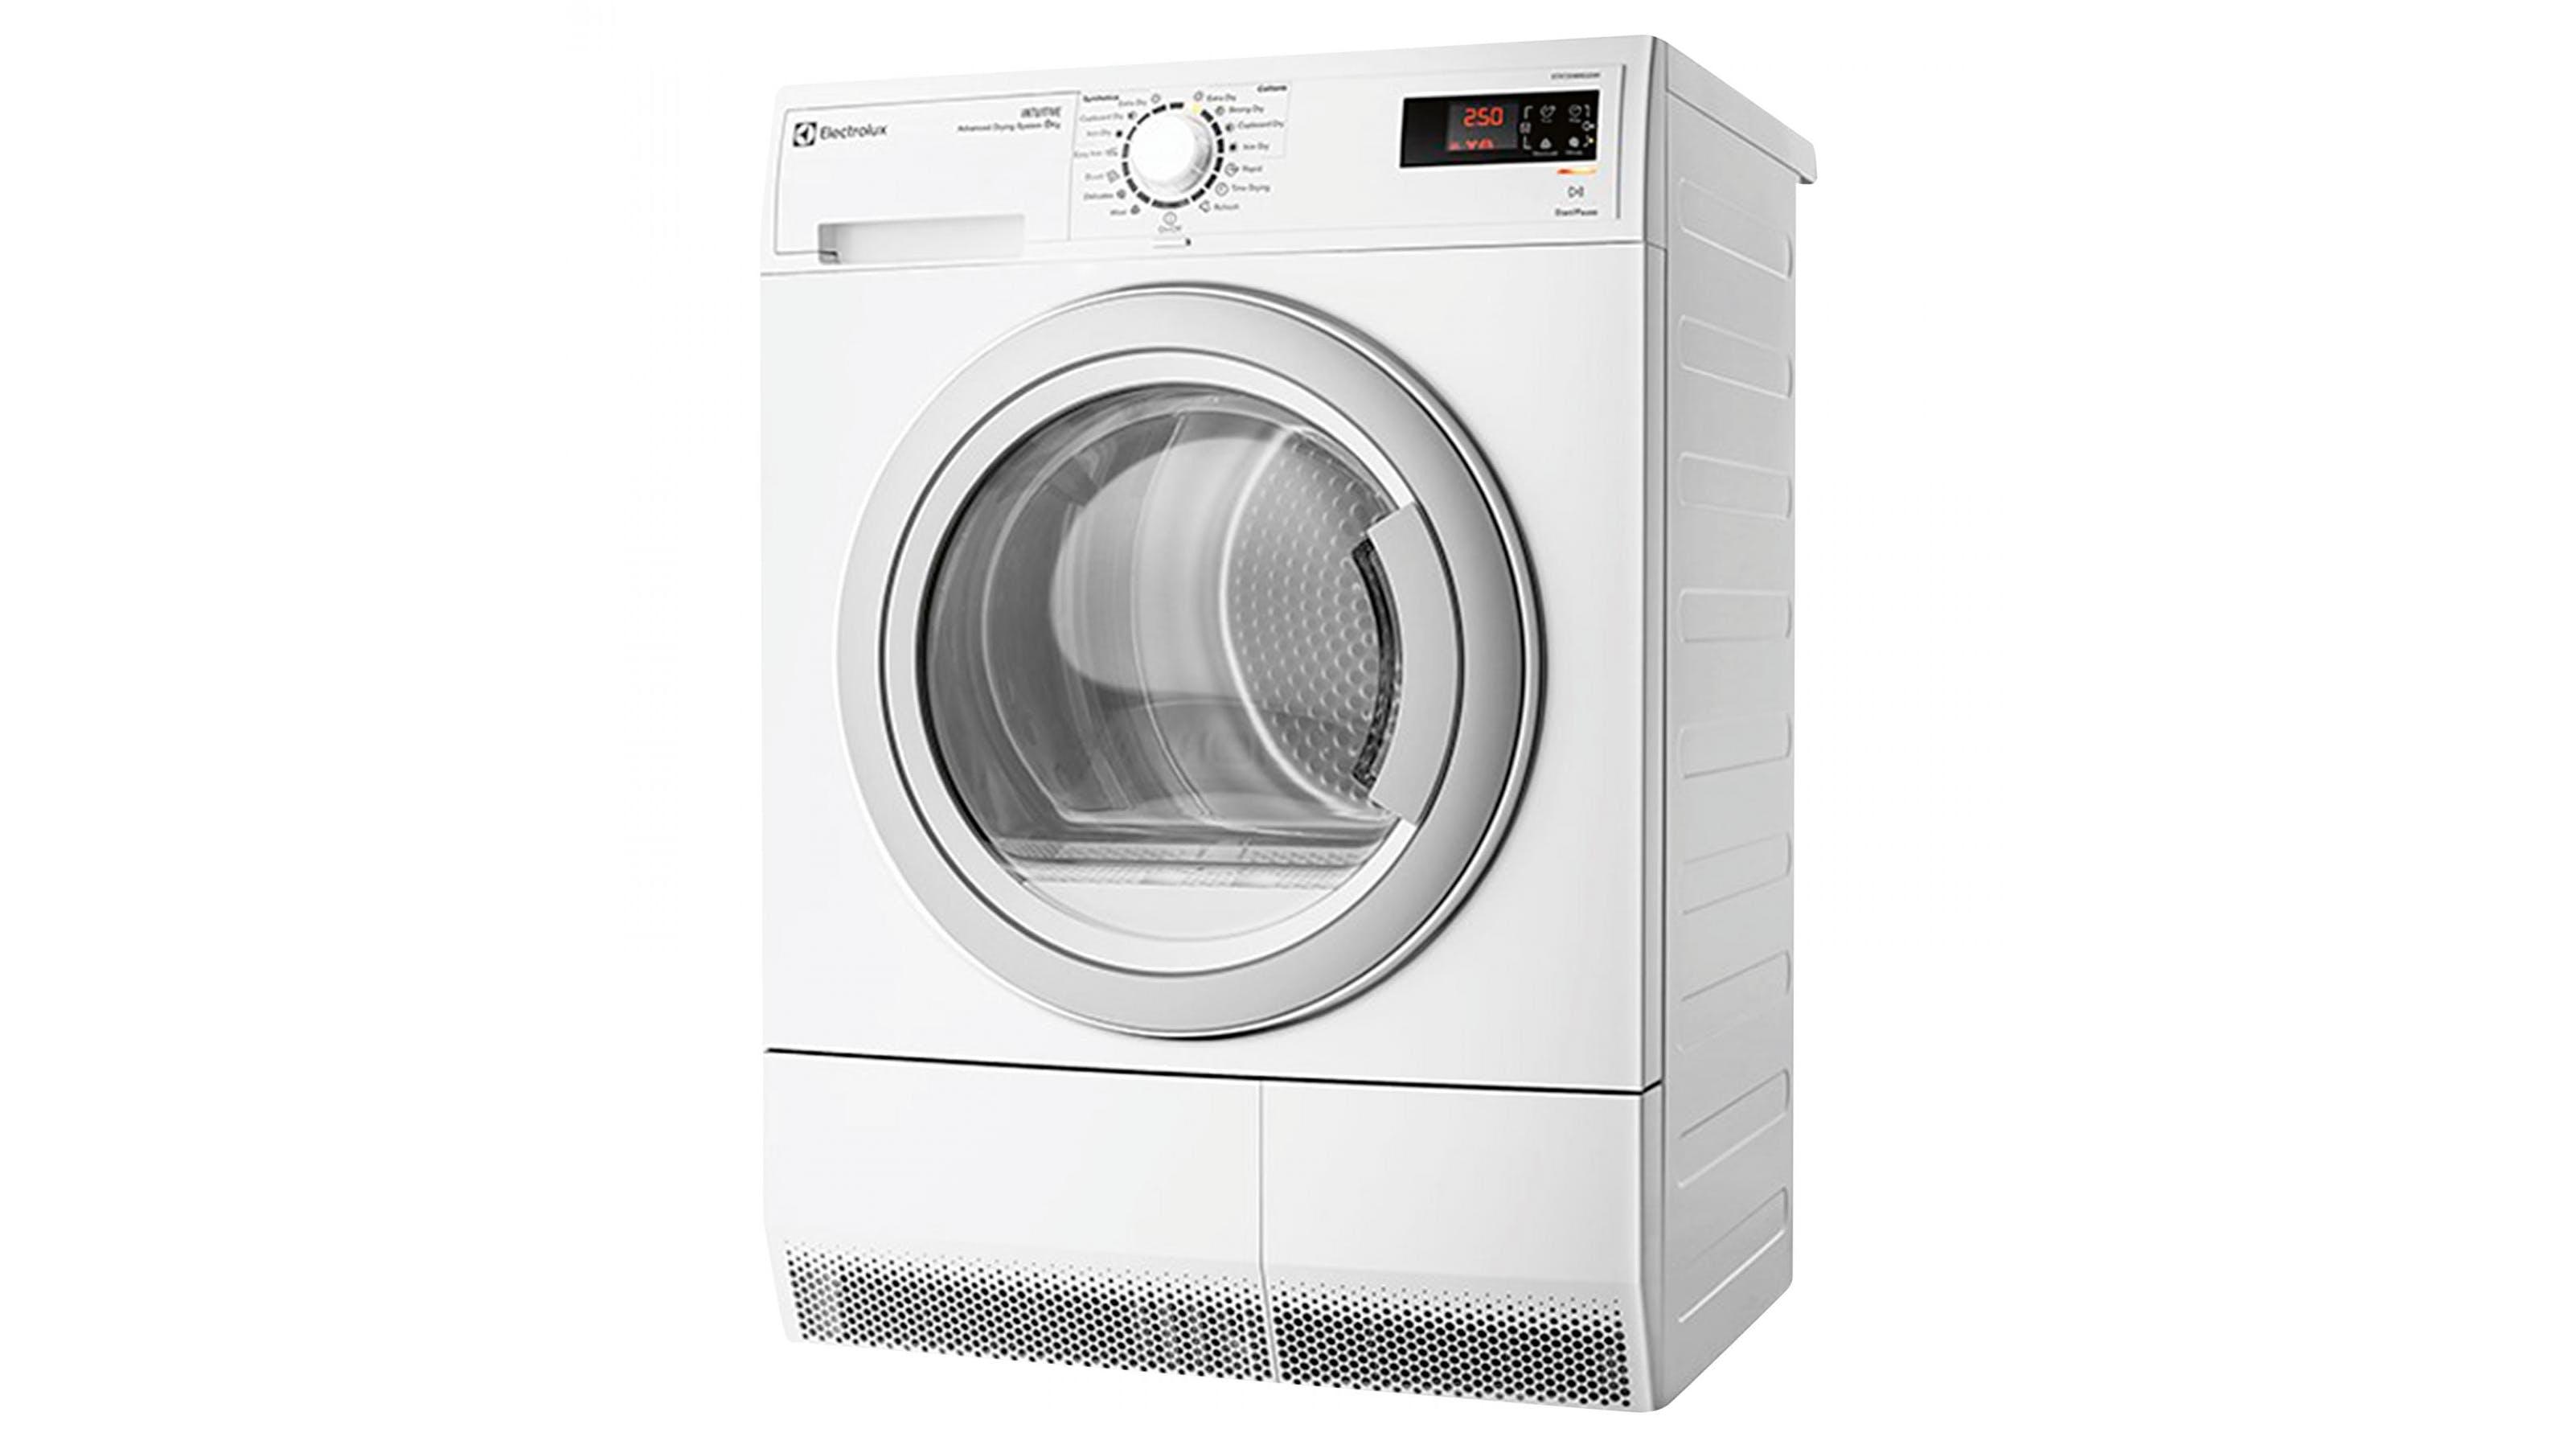 HD wallpapers domayne kitchen appliances 333ddesign.gq